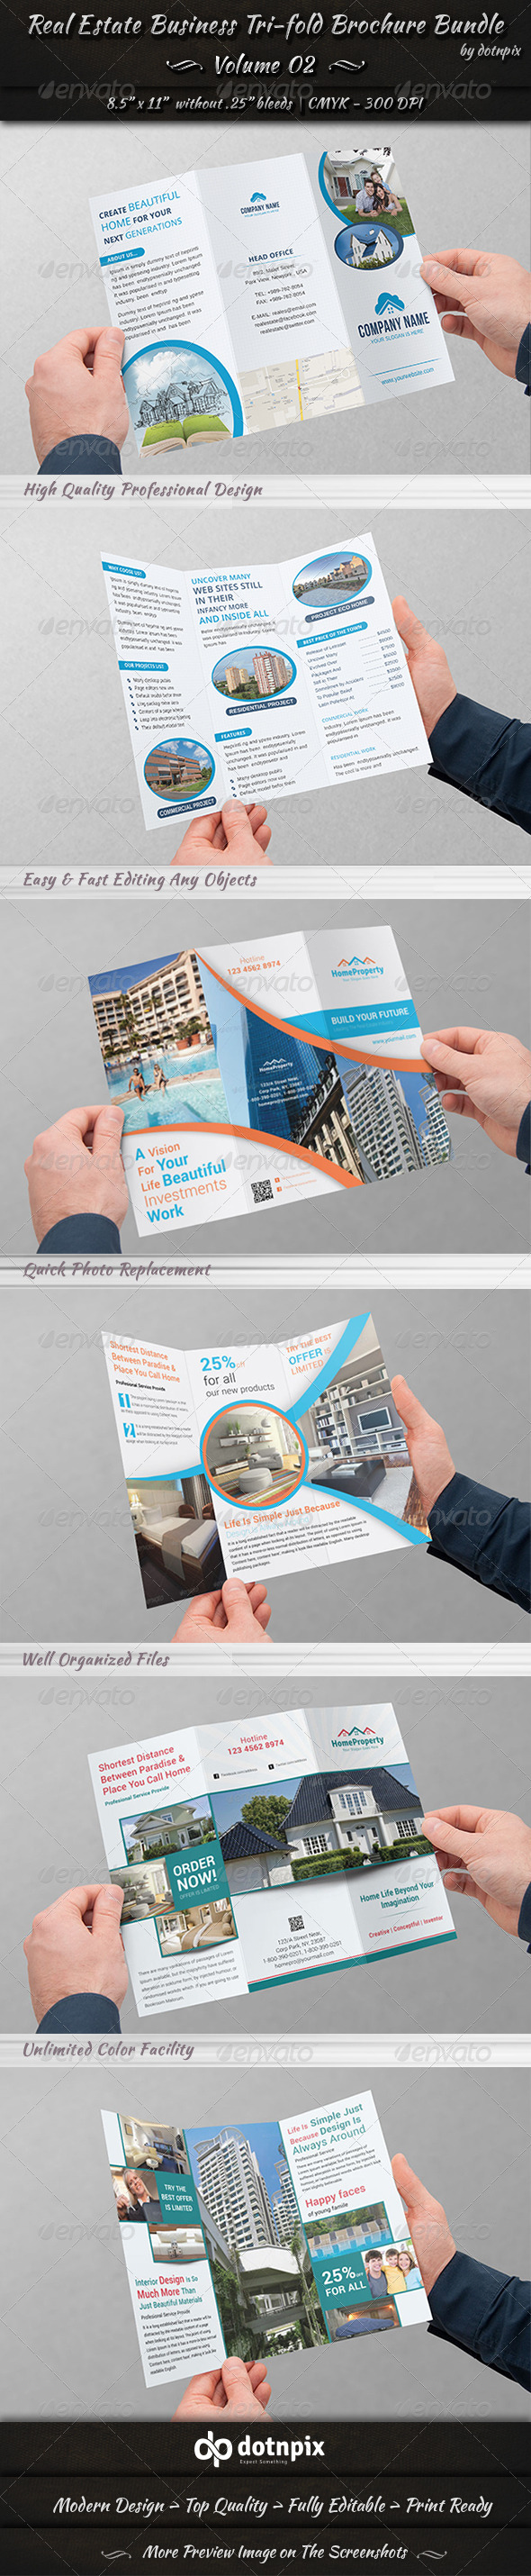 GraphicRiver Real Estate Tri-fold Brochure Bundle Volume 2 7244287